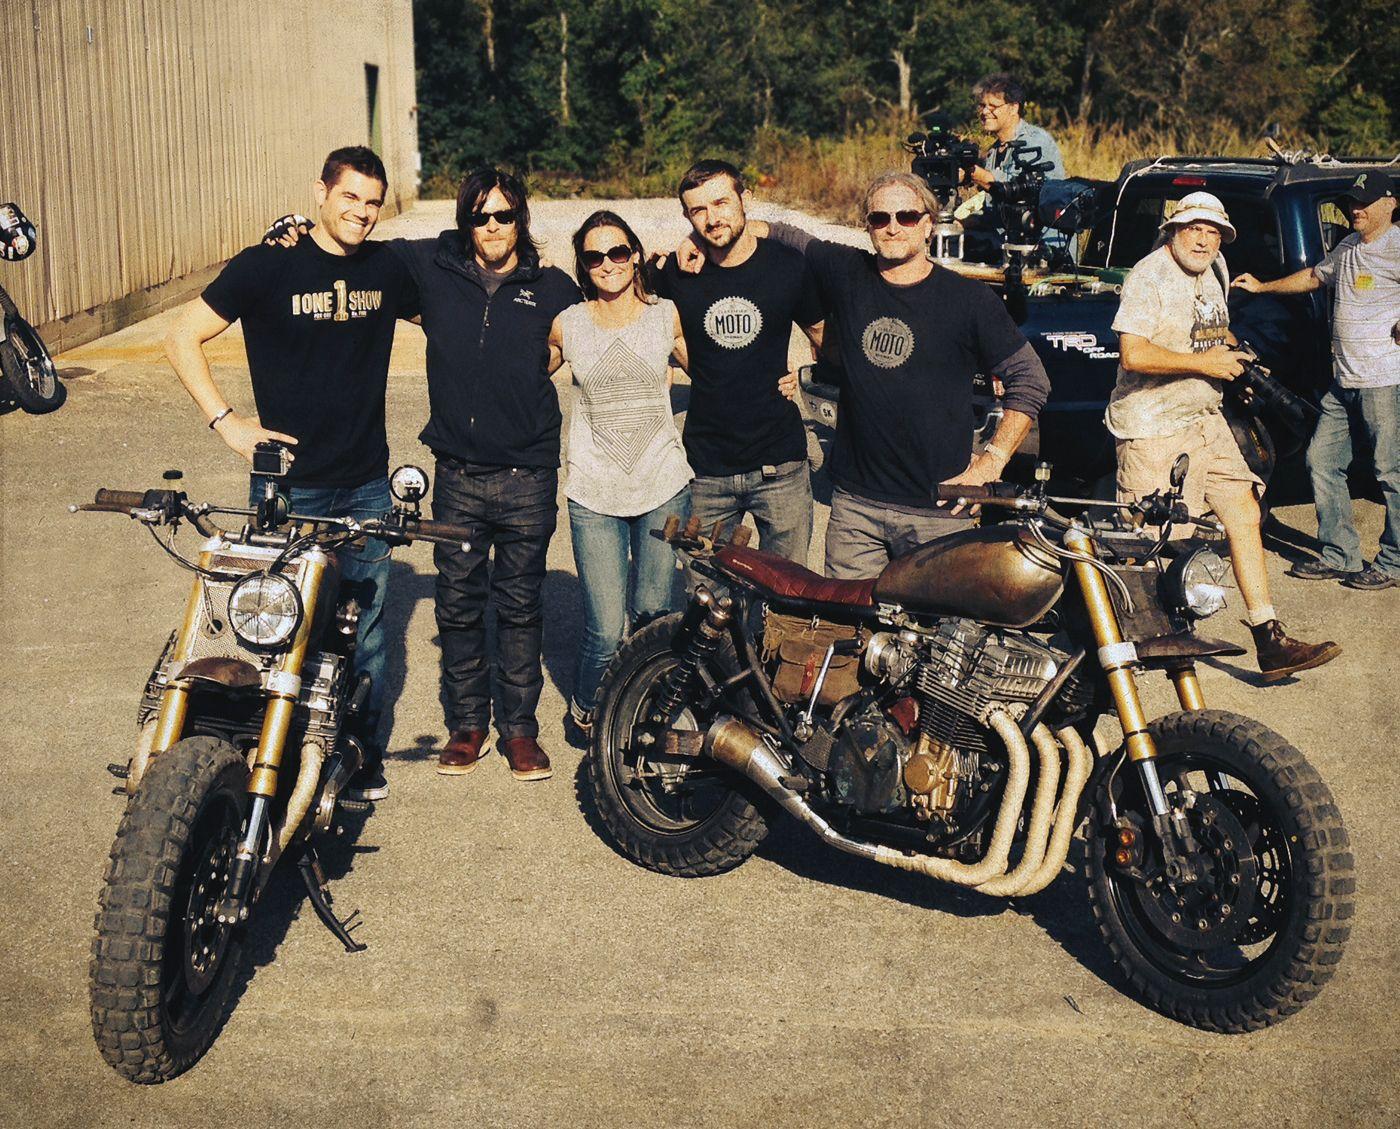 daryl-dixon-the-walking-dead-5-temporada-moto-014